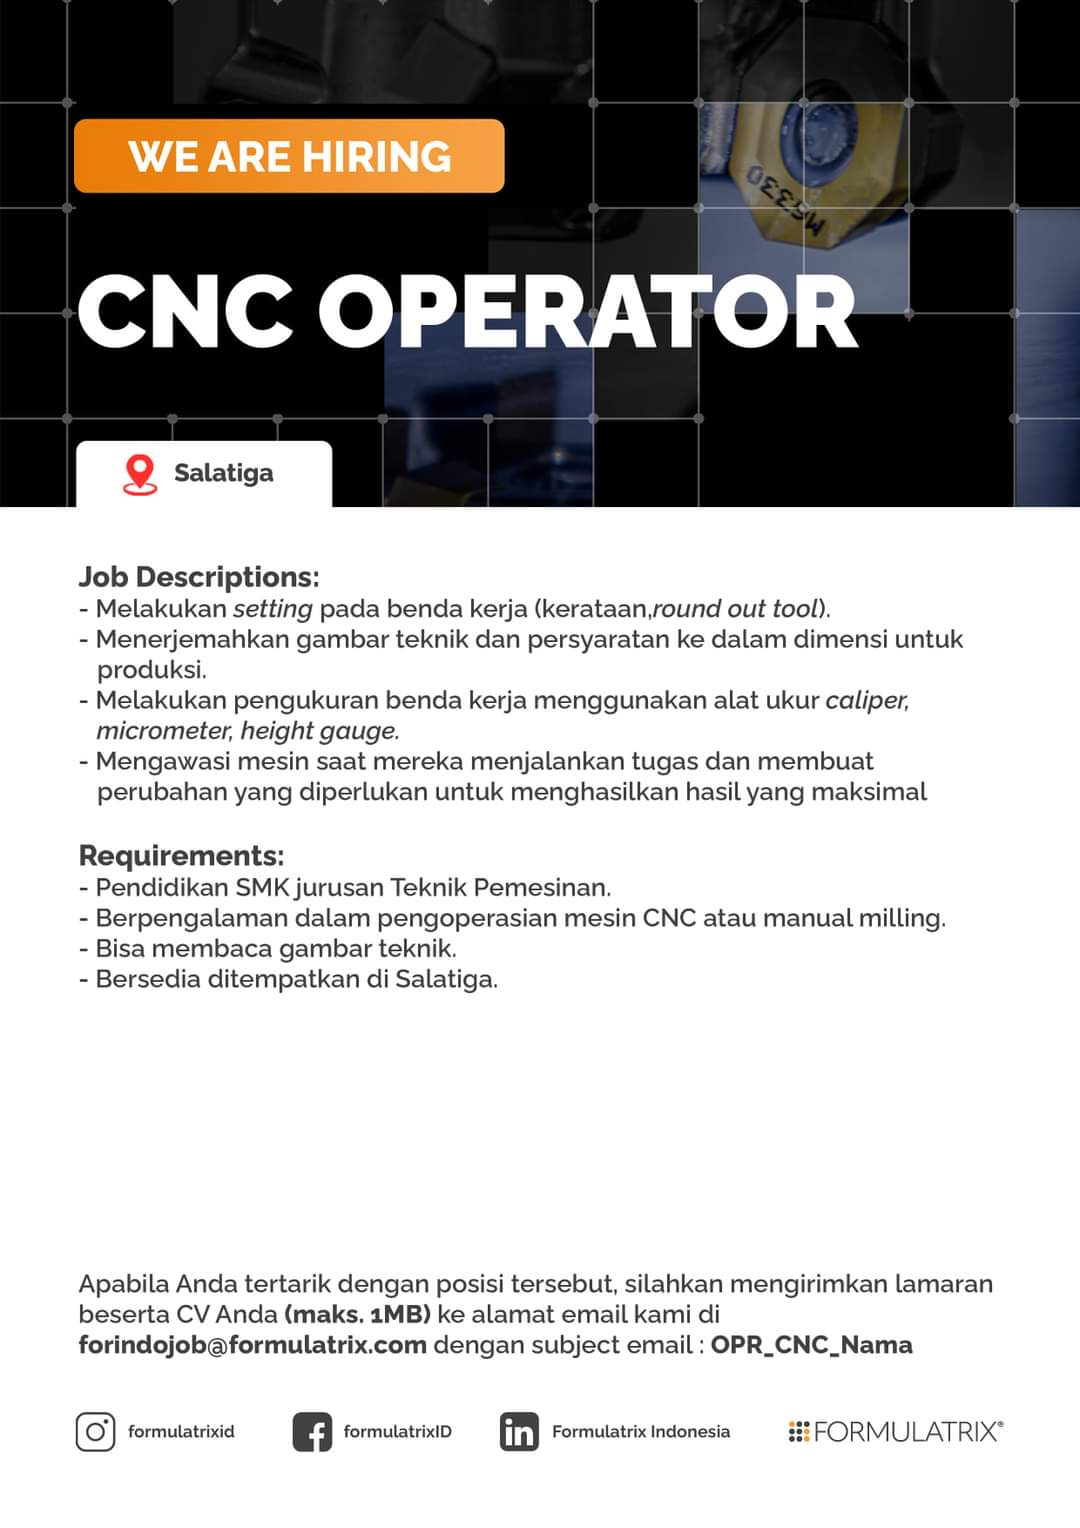 Lowongan Salatiga & Semarang Formulatrix Indonesia Untuk Posisi CNC Operator & Quality Control Staff